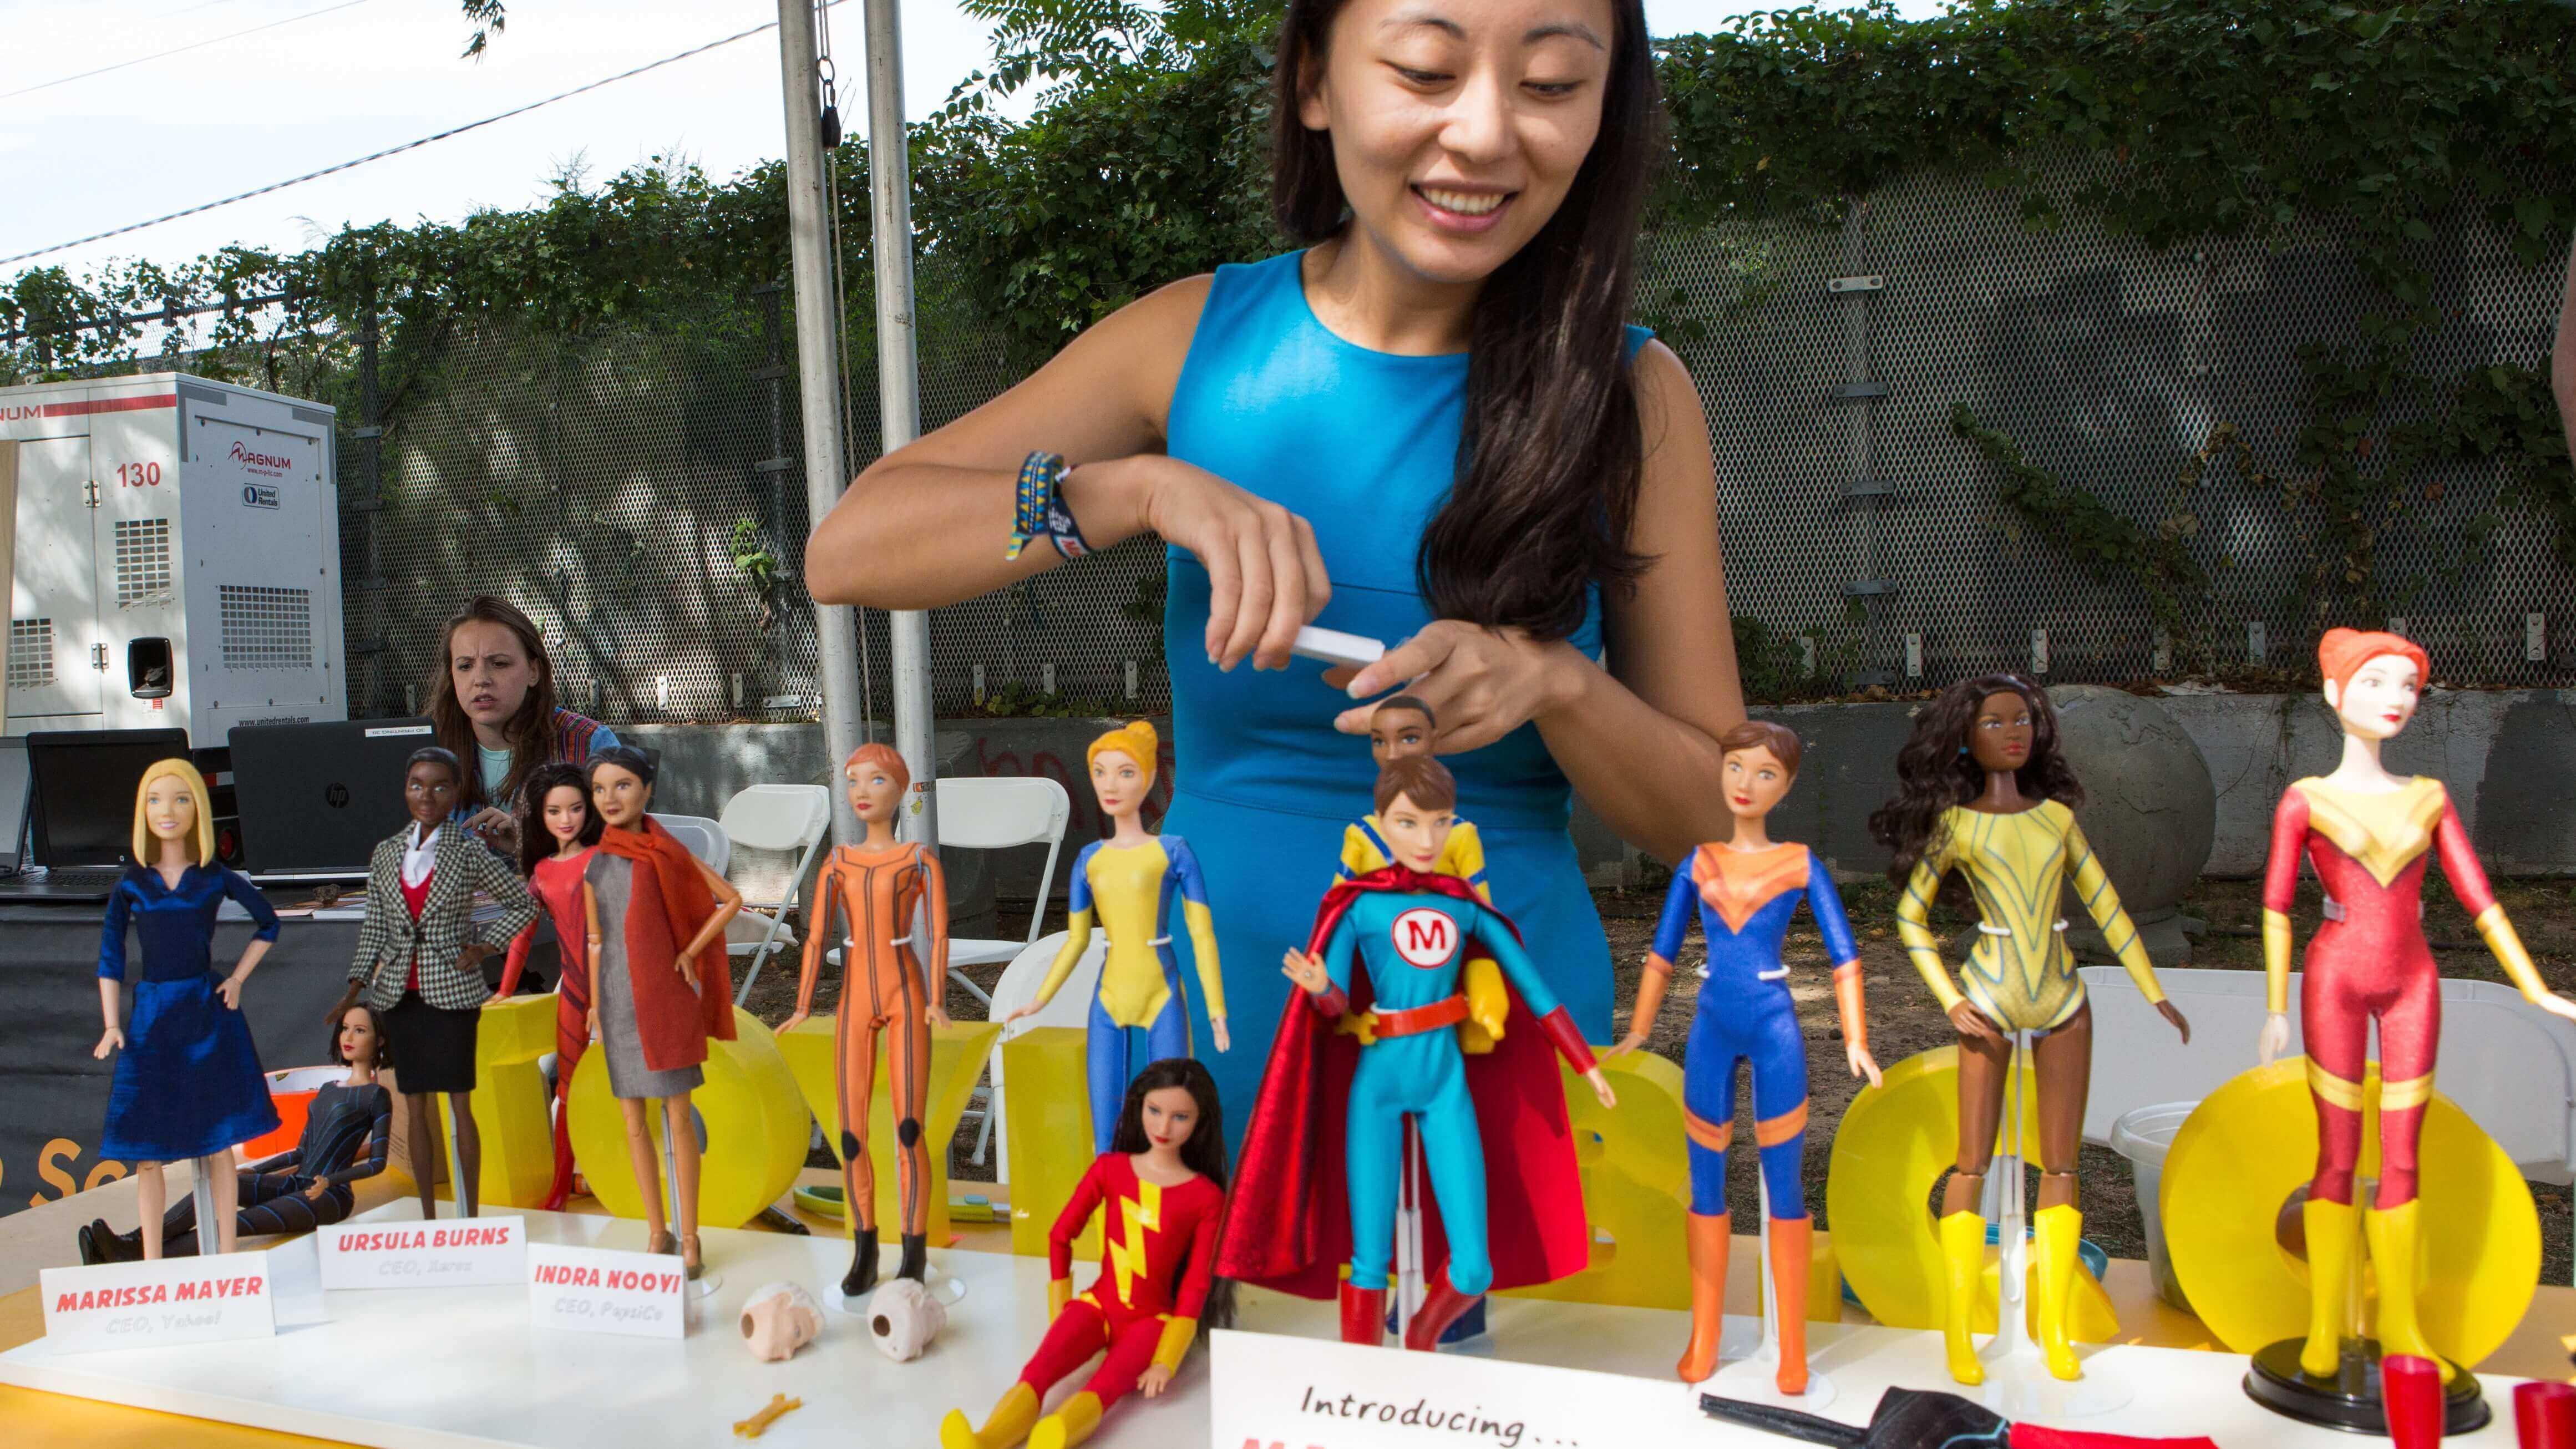 Maker Girl: 3D Printed Action Figures Send Positive Message | All3DP